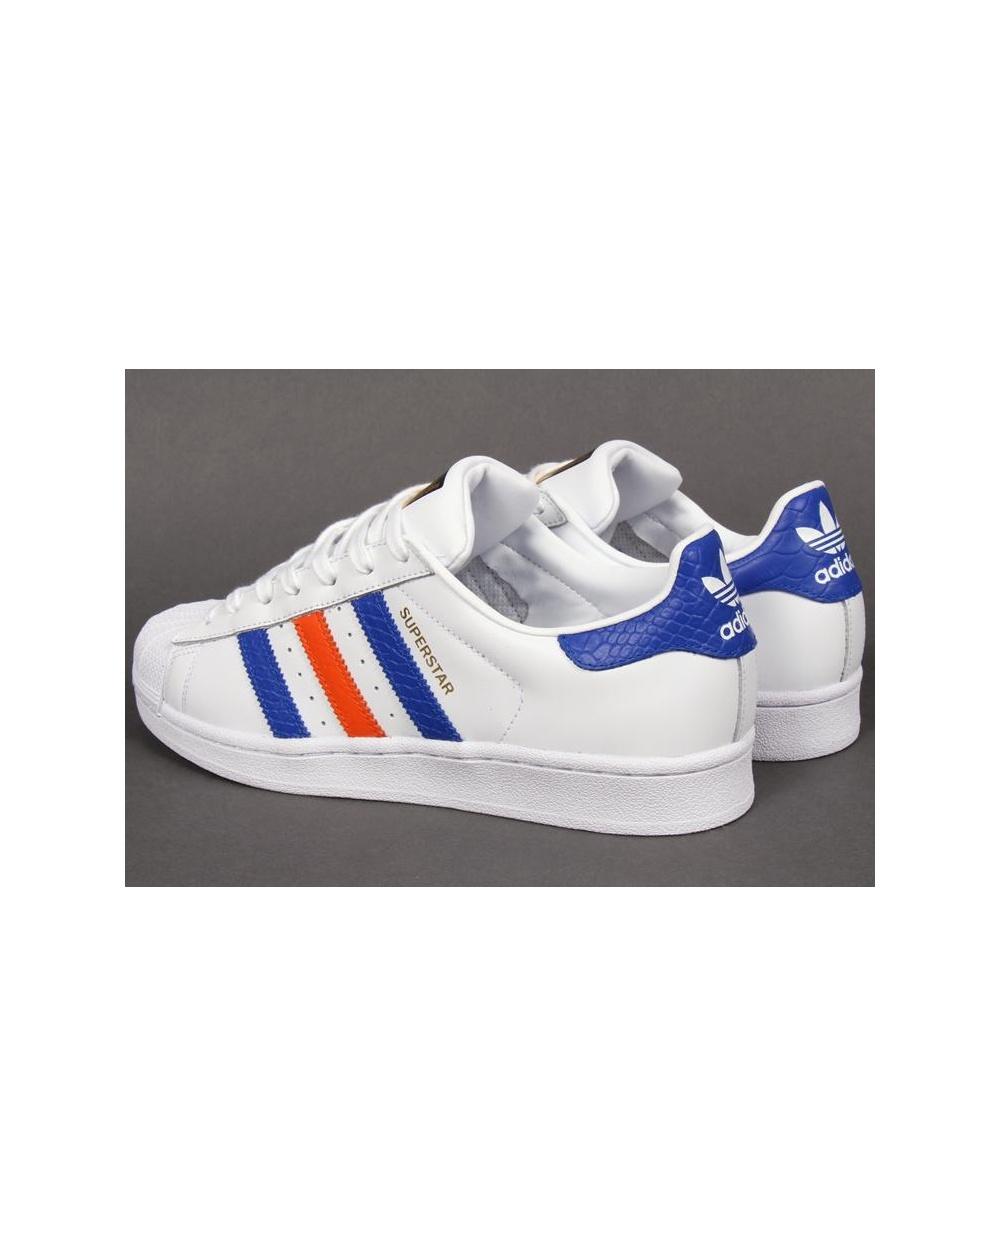 uk availability 4da6d c420a adidas superstar red white blue